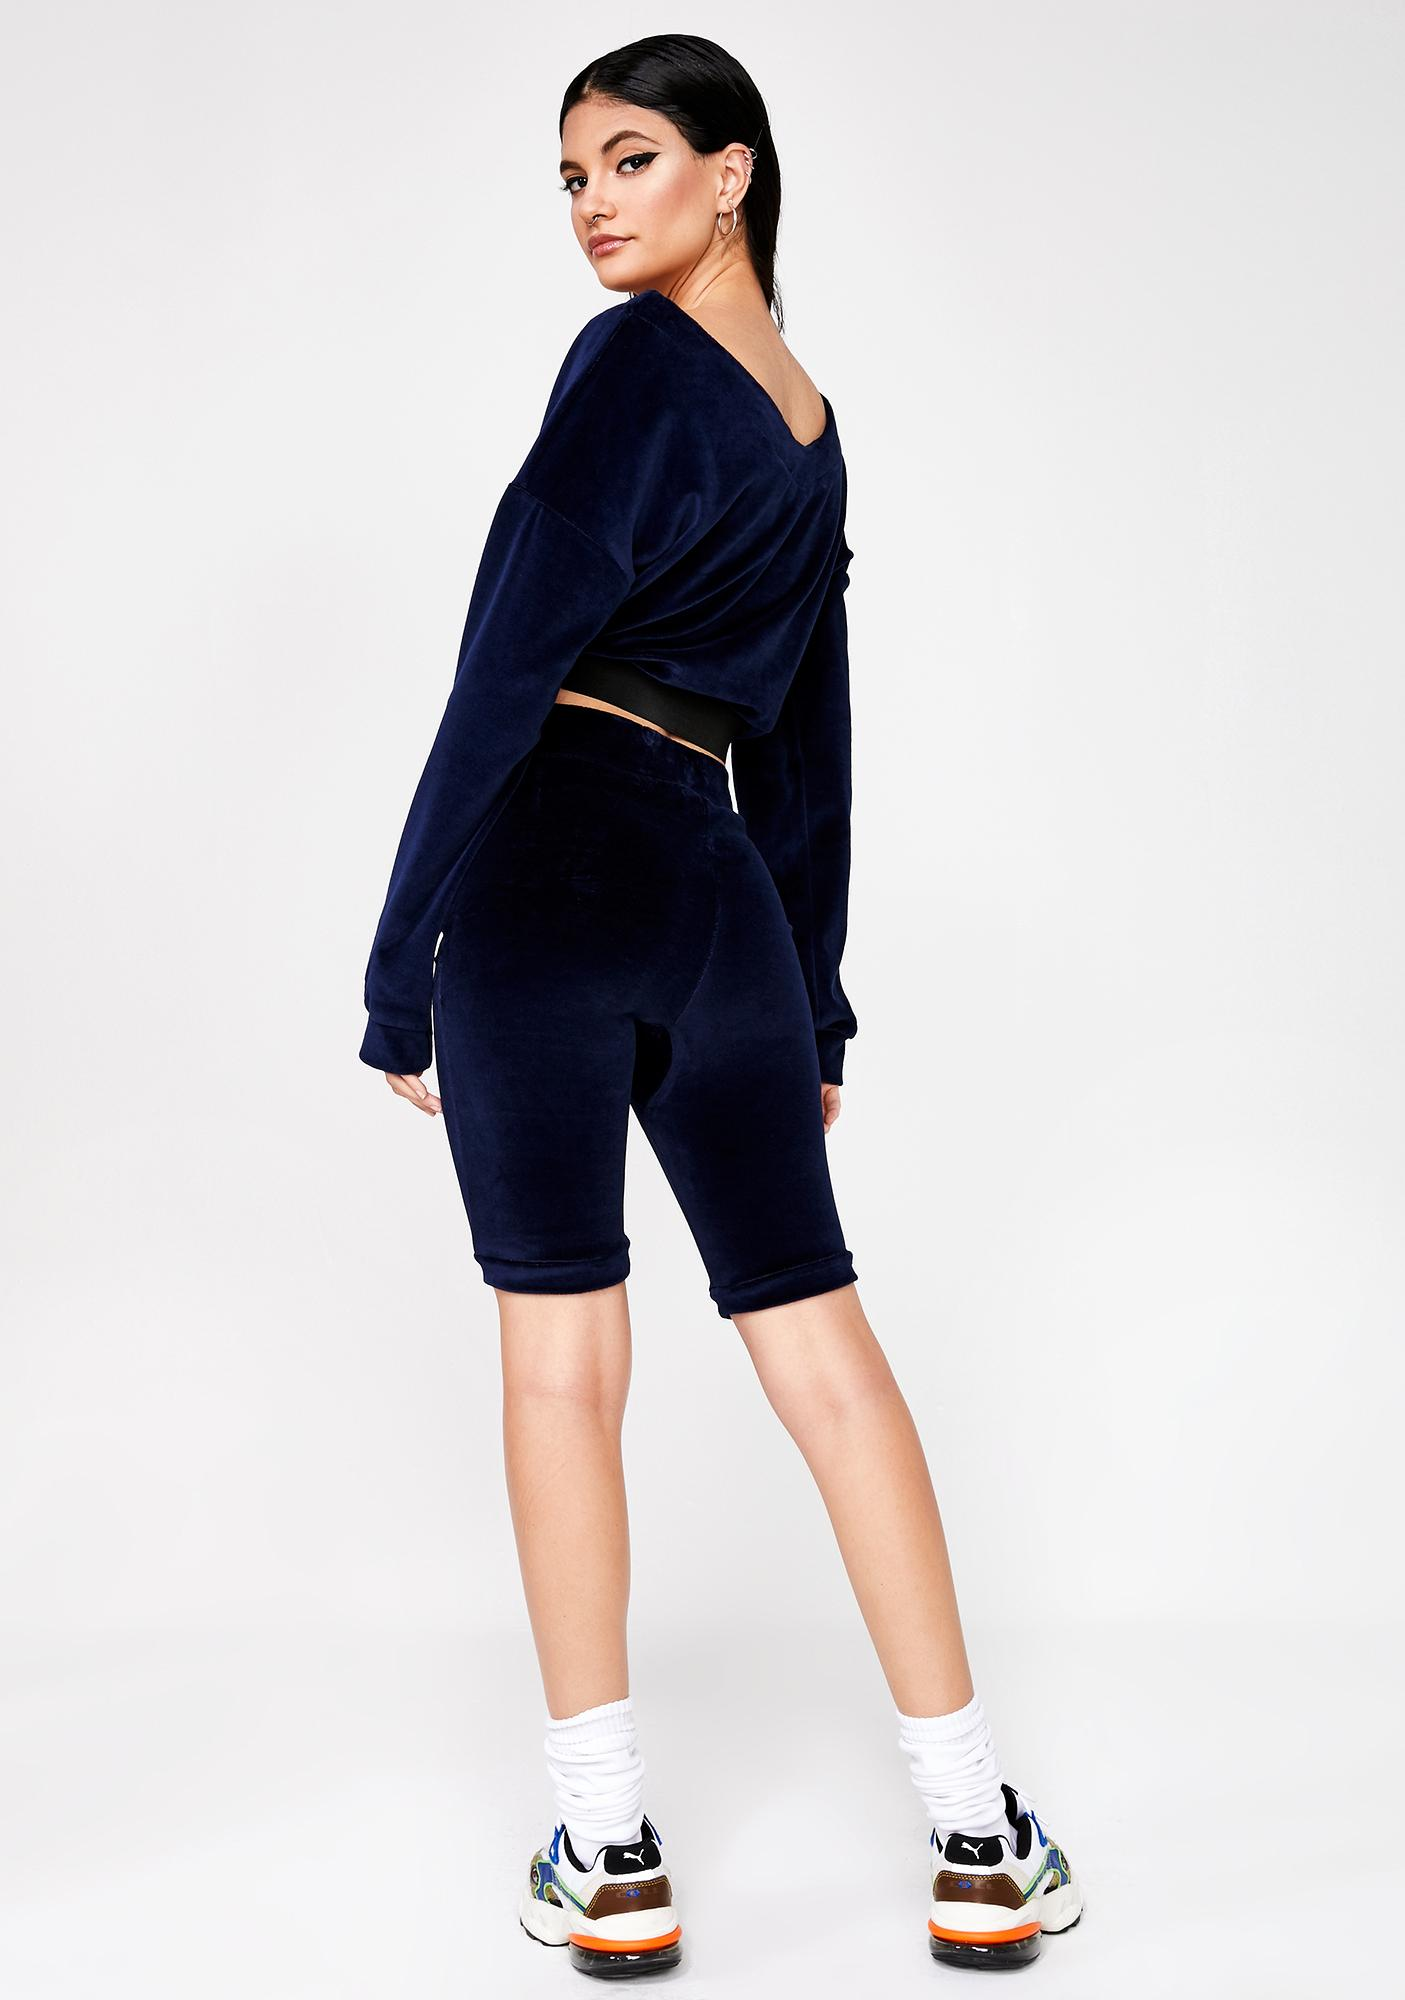 Criminal Damage Velour Structured Shorts